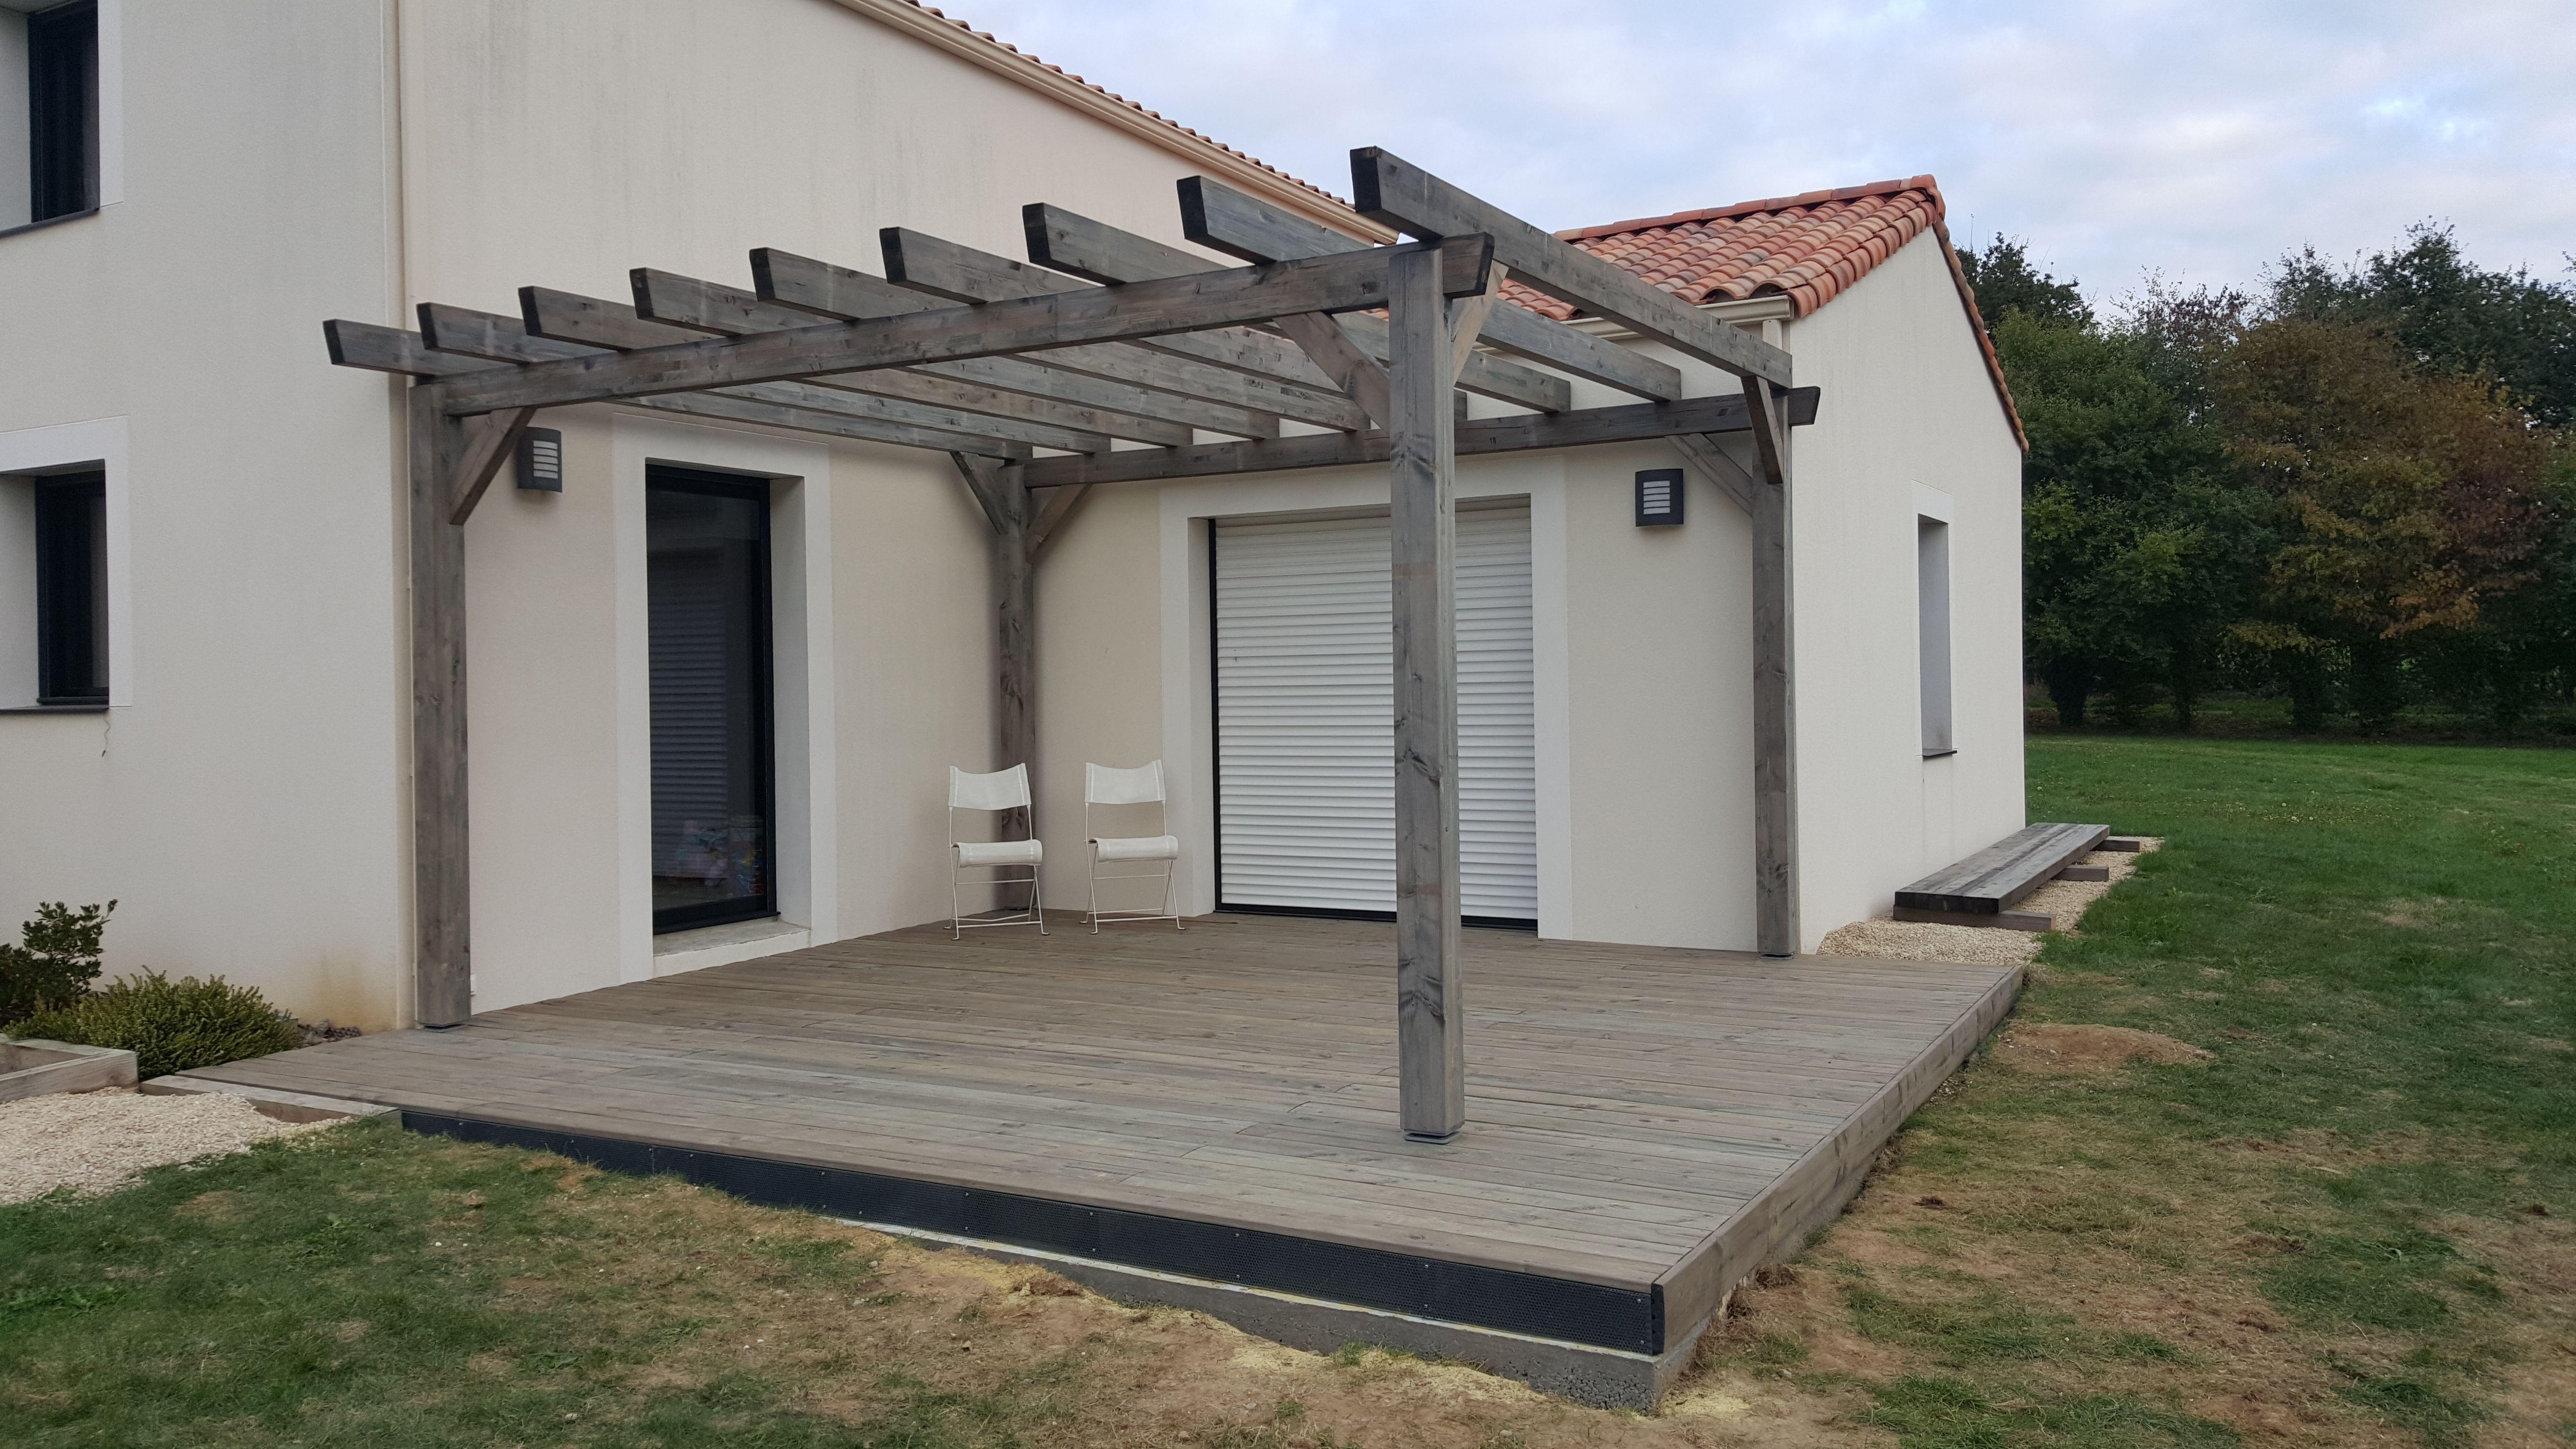 superbe r alisation bois d 39 une terrasse catalina ainsi qu 39 une jolie pergola albizia. Black Bedroom Furniture Sets. Home Design Ideas